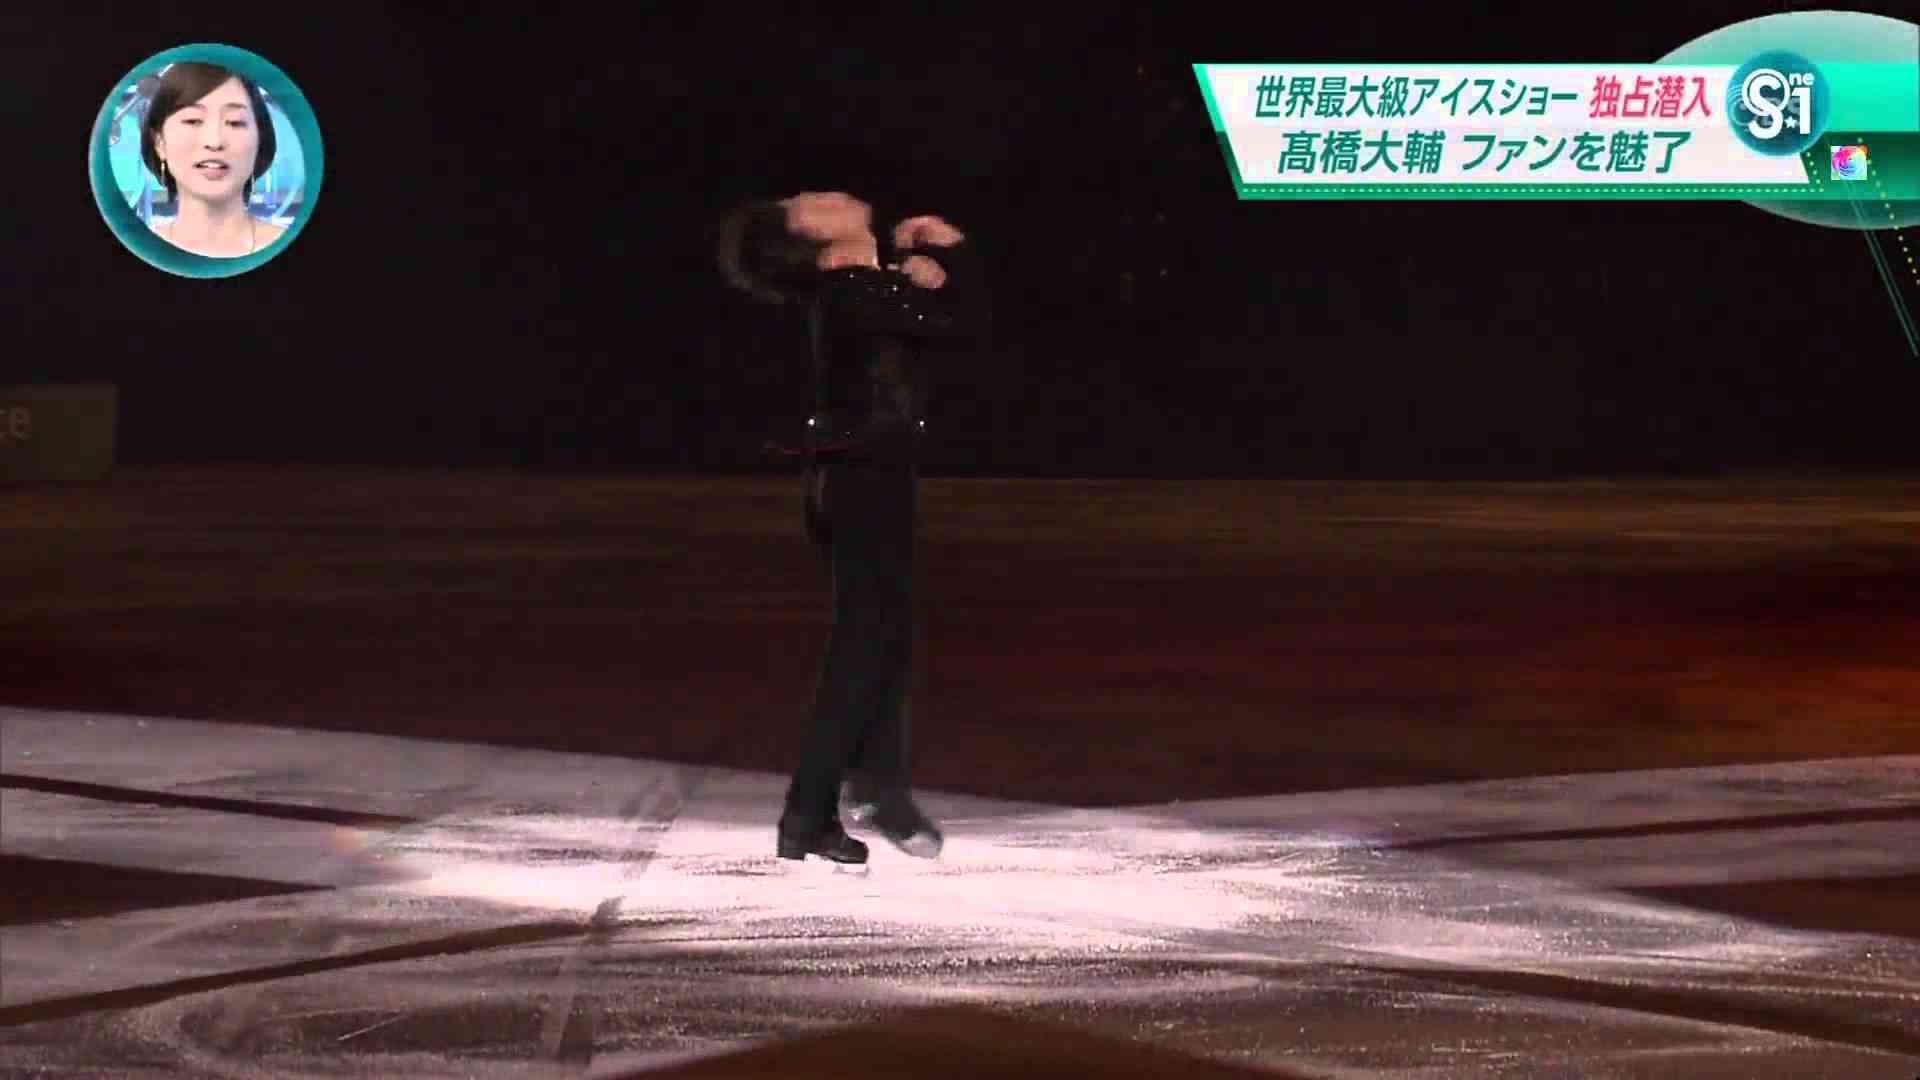 AOI_Daisuke Takahashi / 4CC / S1 2015.2.15 - YouTube